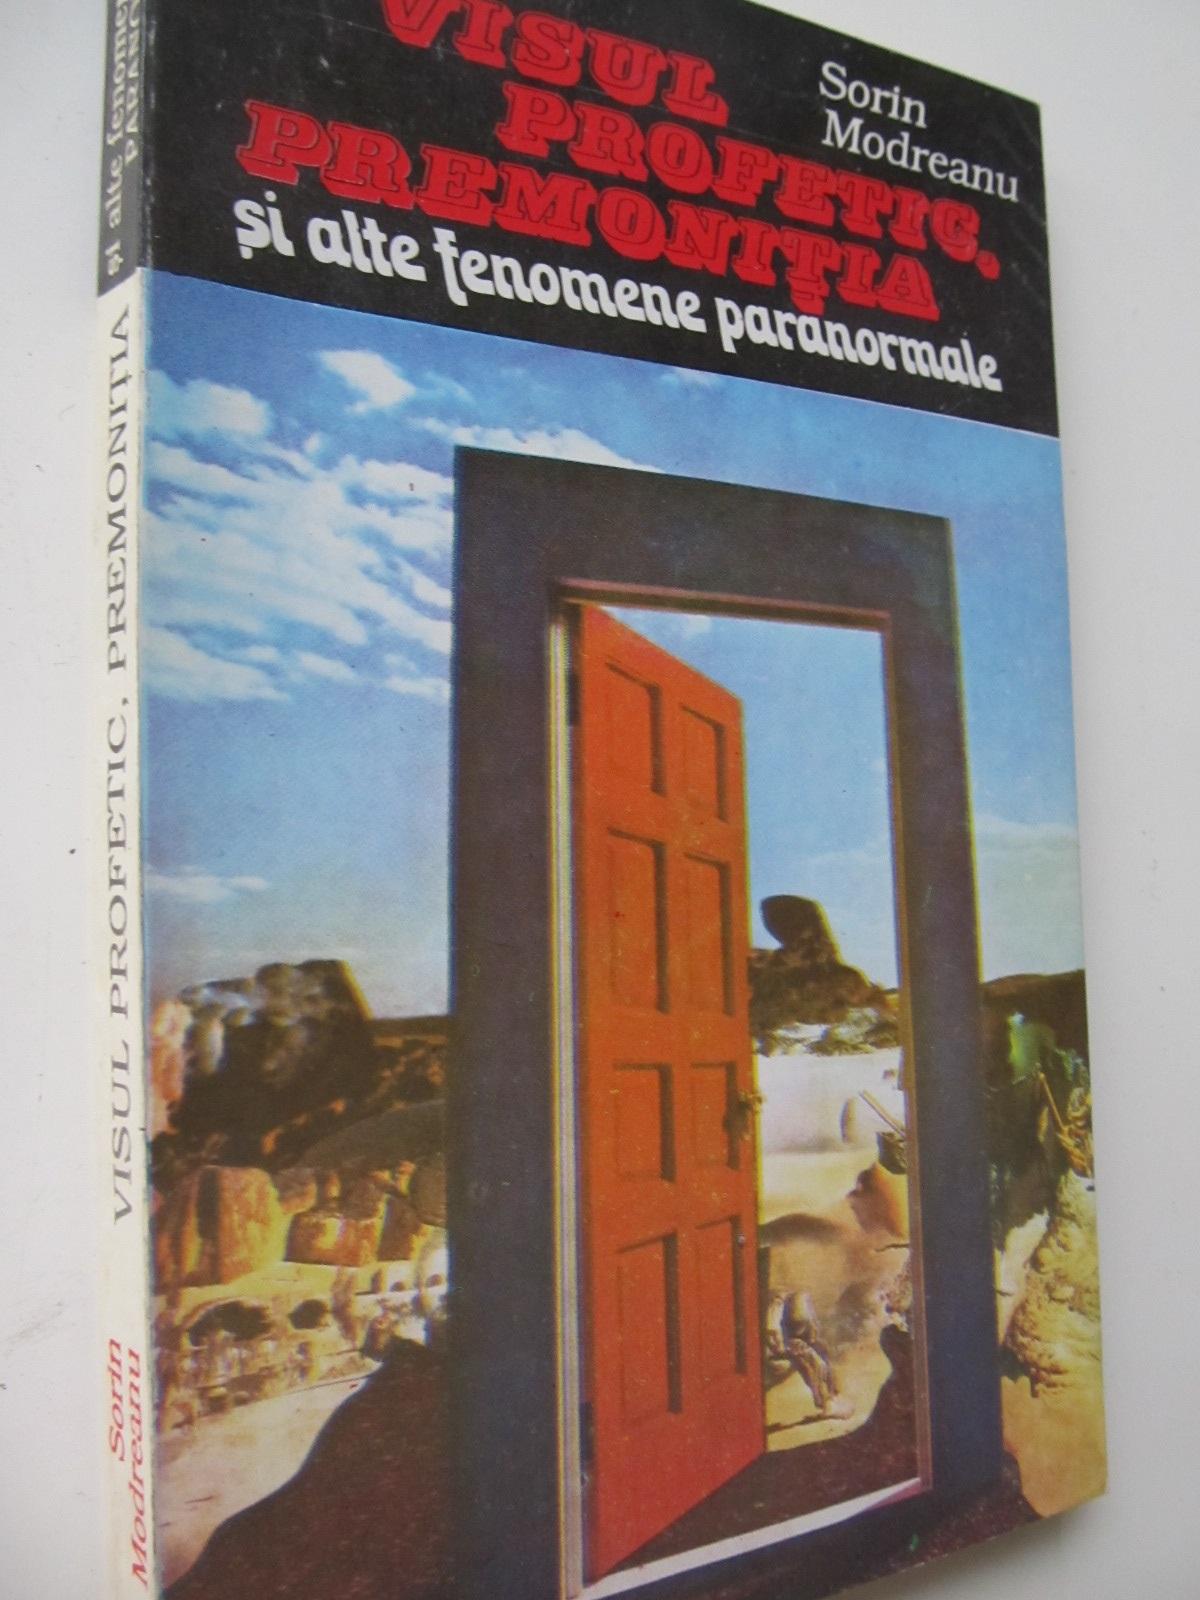 Visul profetic premonitia si alte fenomene paranormale - Sorin Modreanu | Detalii carte